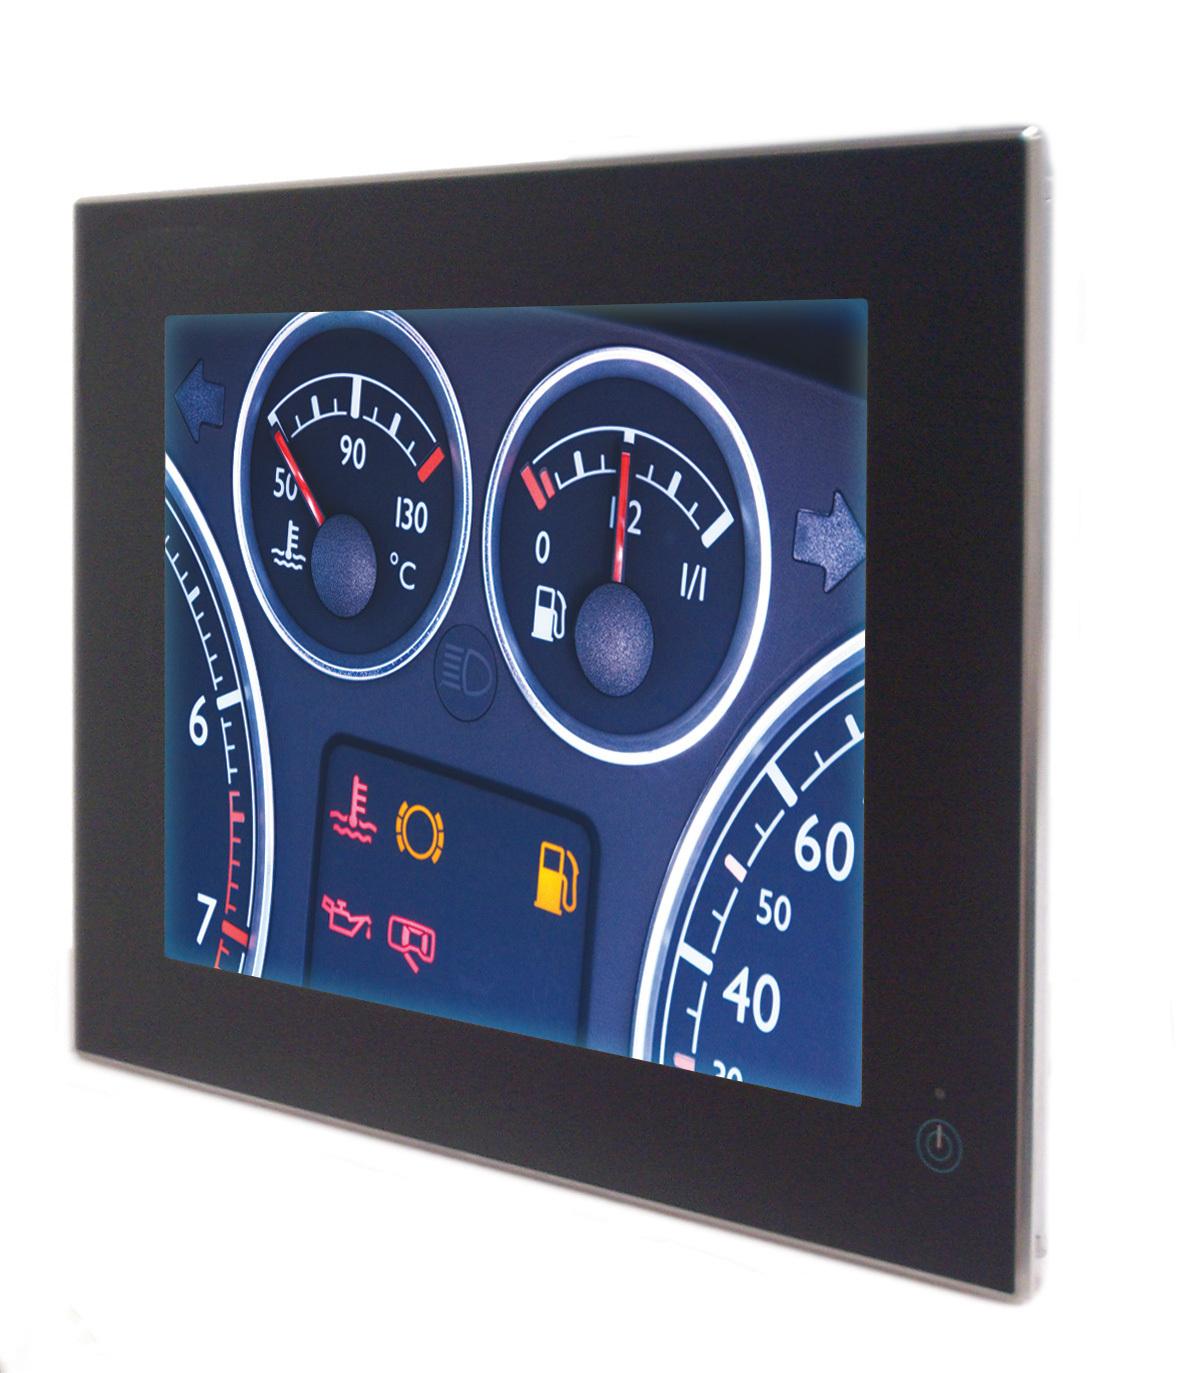 Positive Train Control (PTC), Human Machine Interface (HMI), Locomotive Cab Computer Displays, In-Vehicle Displays (Photo: Business Wire)